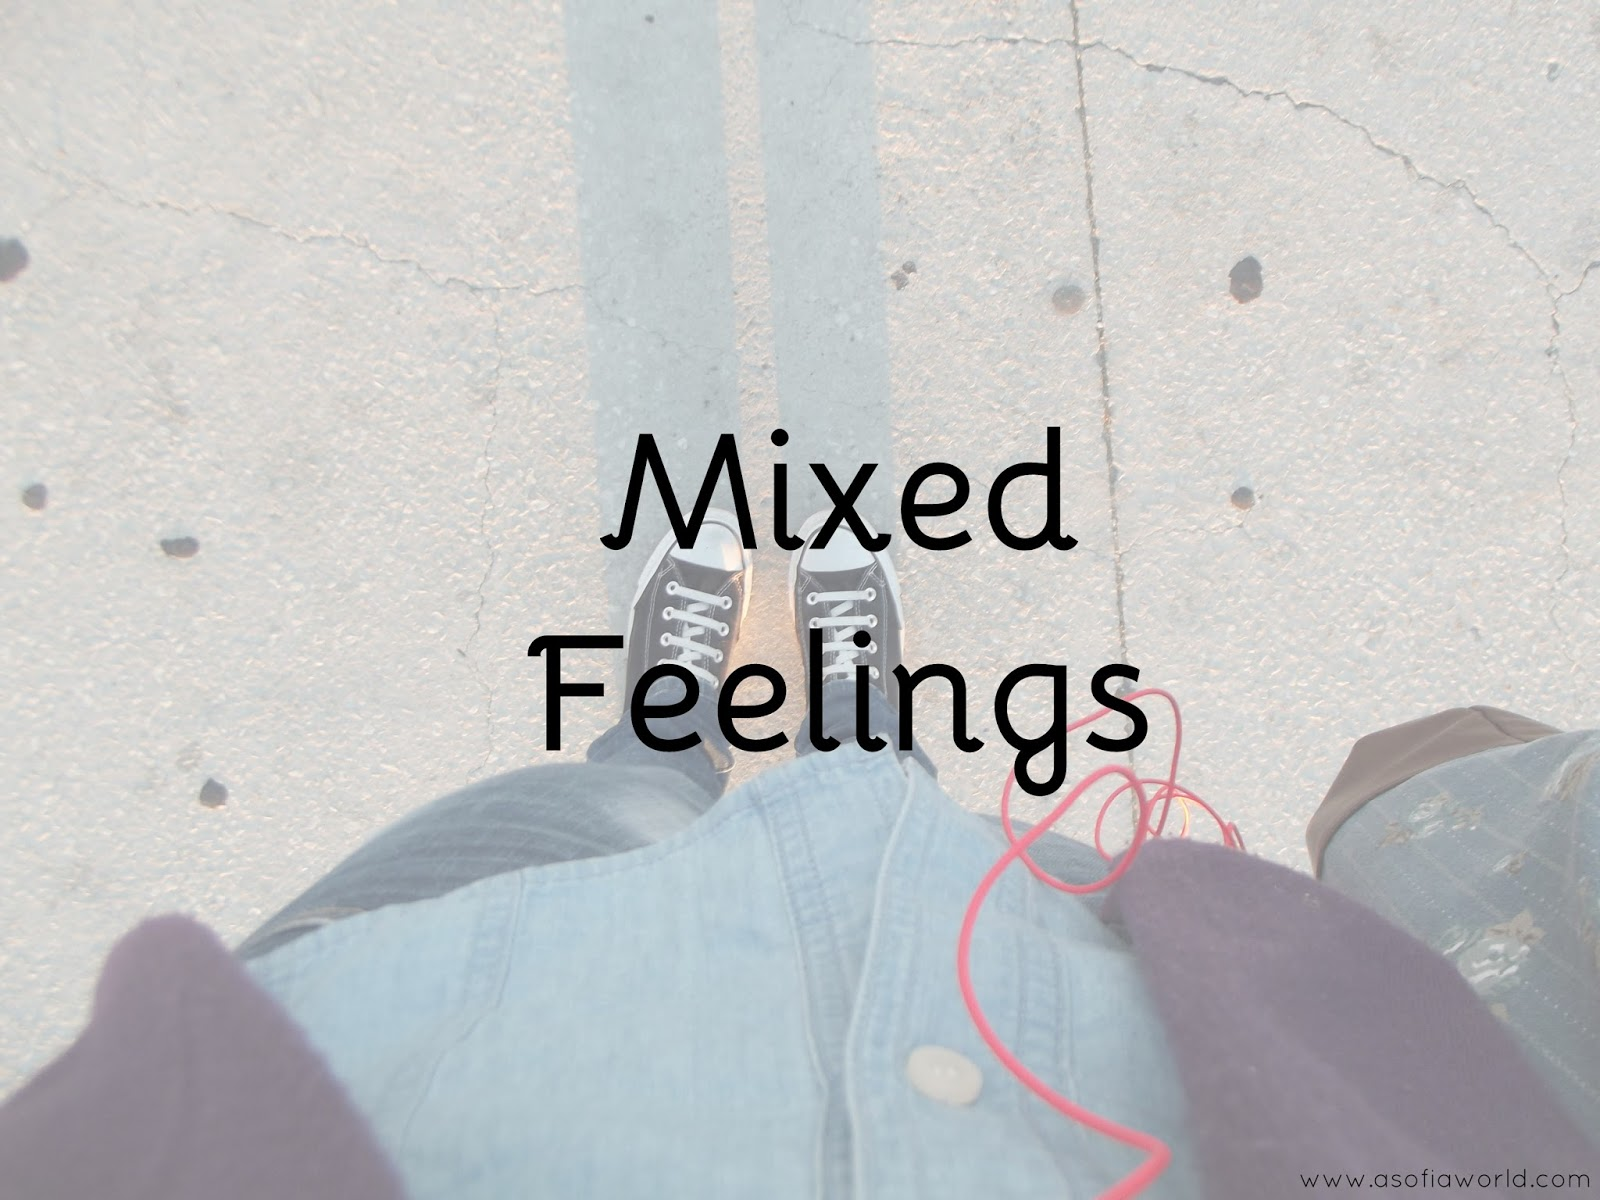 around with music